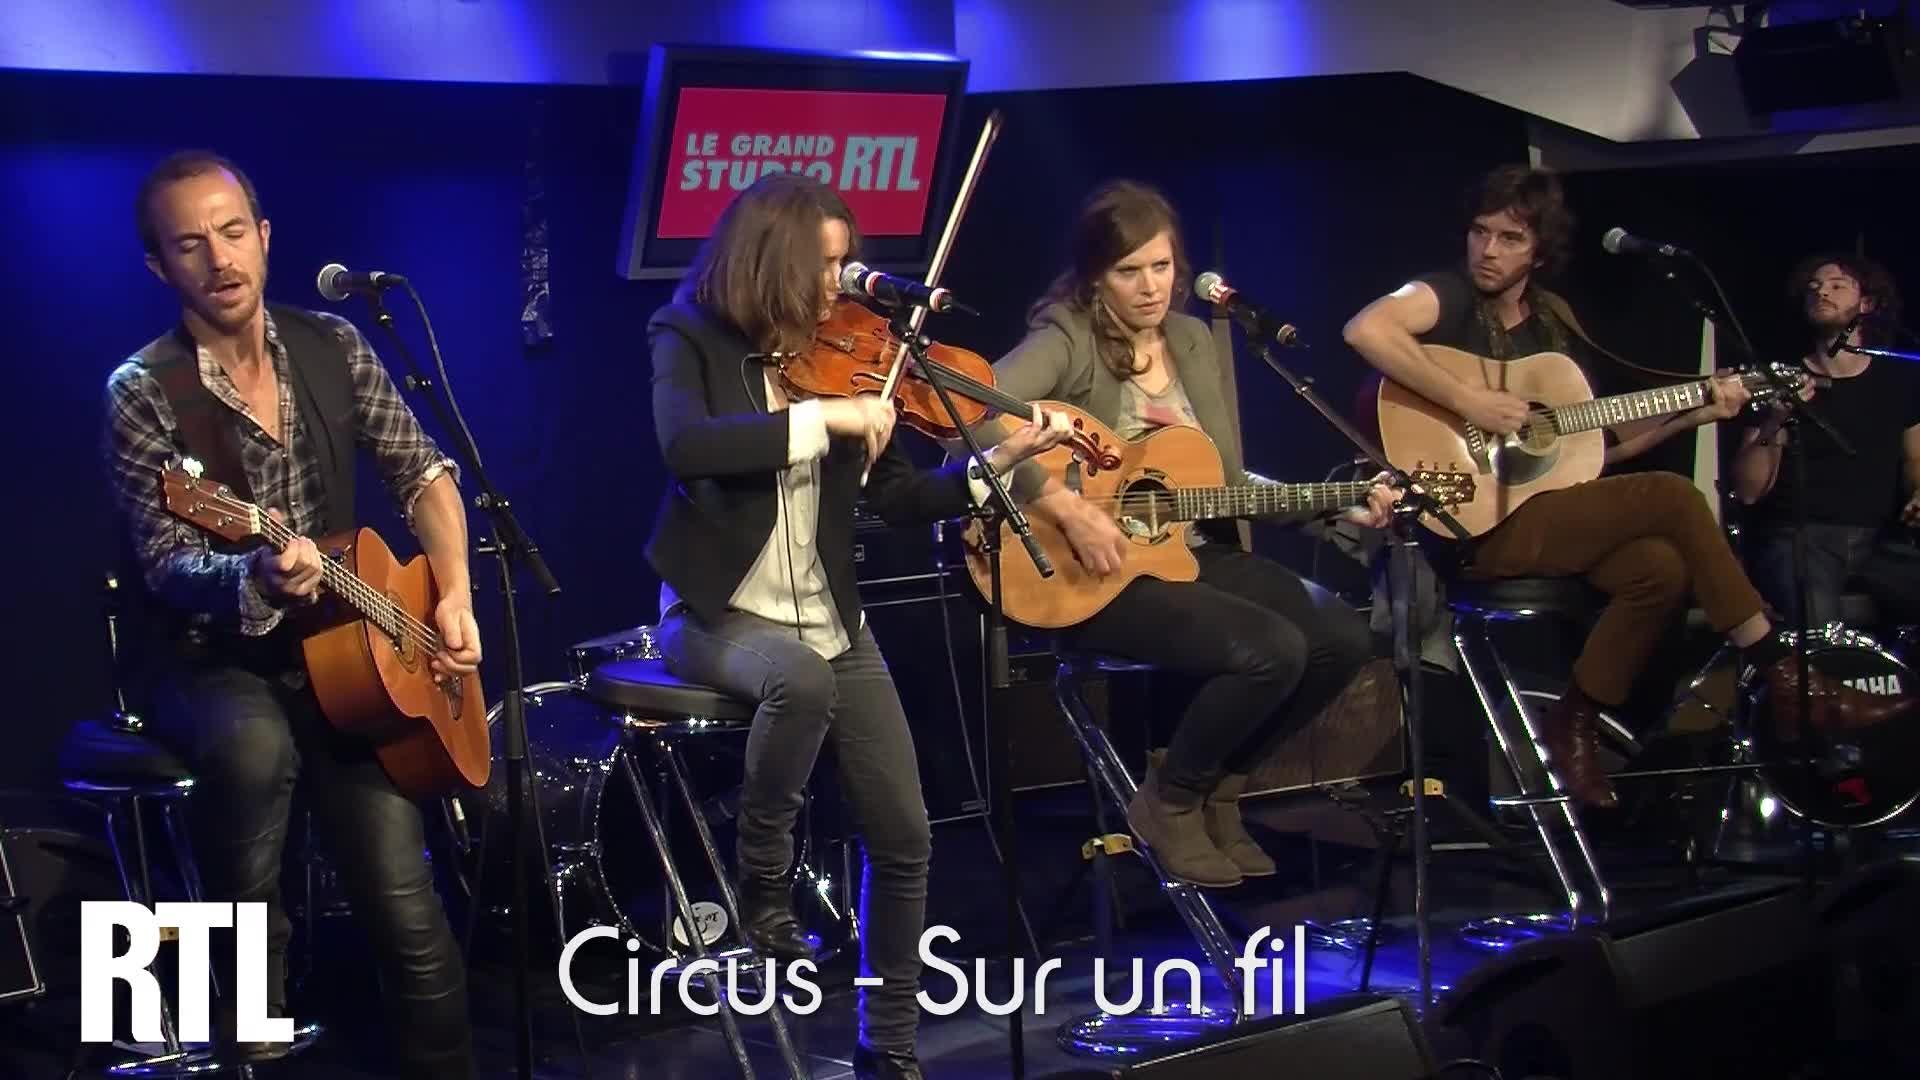 Media Circus Le Grand Studio